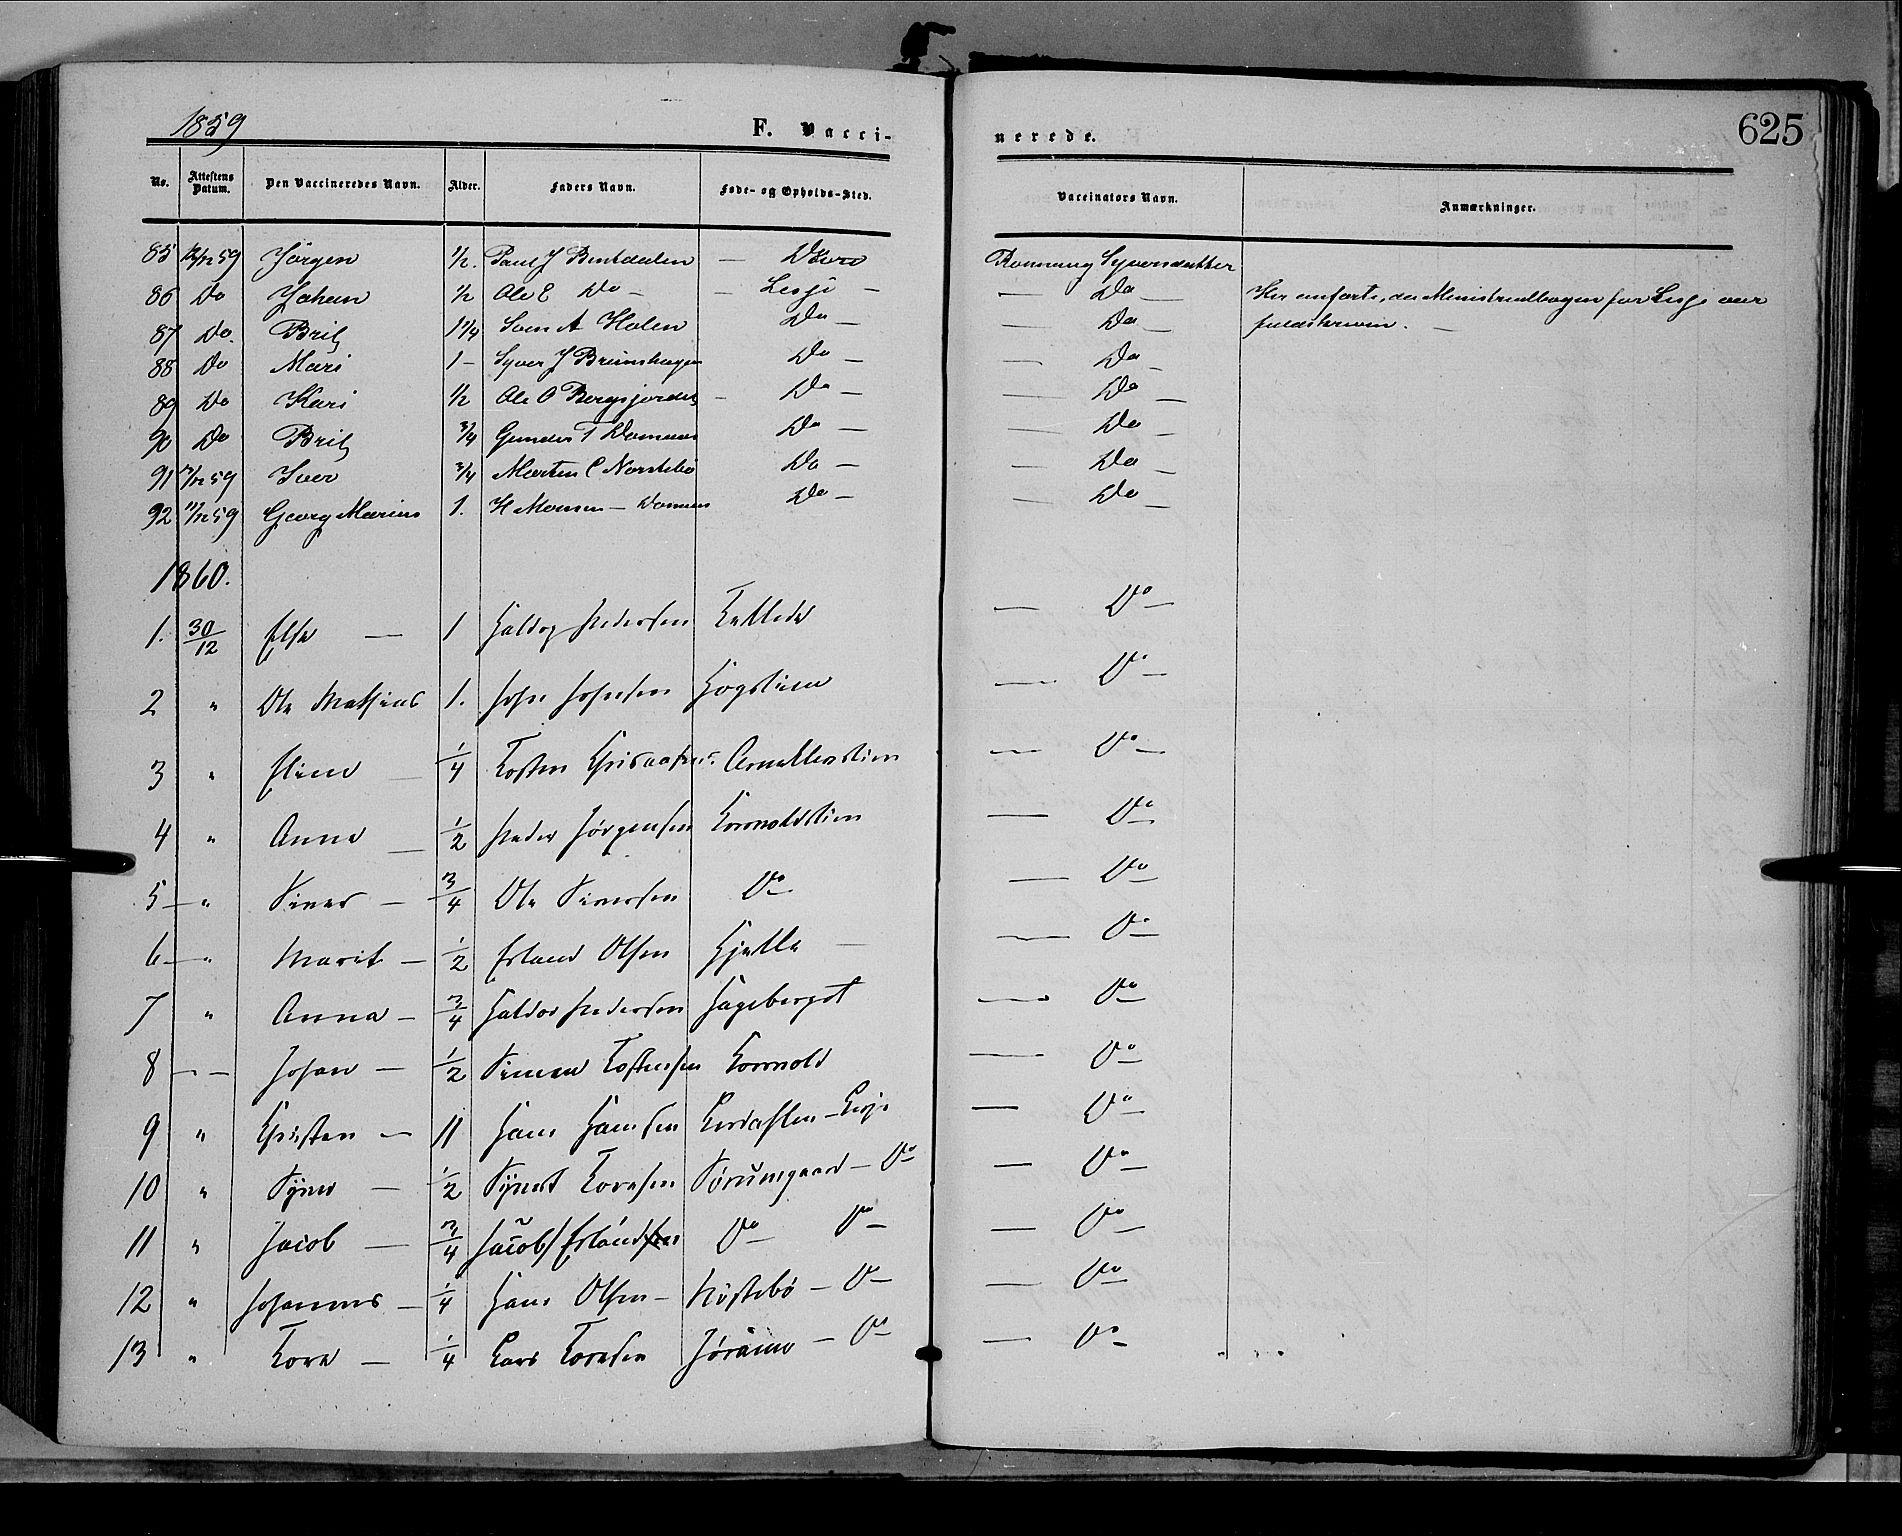 SAH, Dovre prestekontor, Ministerialbok nr. 1, 1854-1878, s. 625